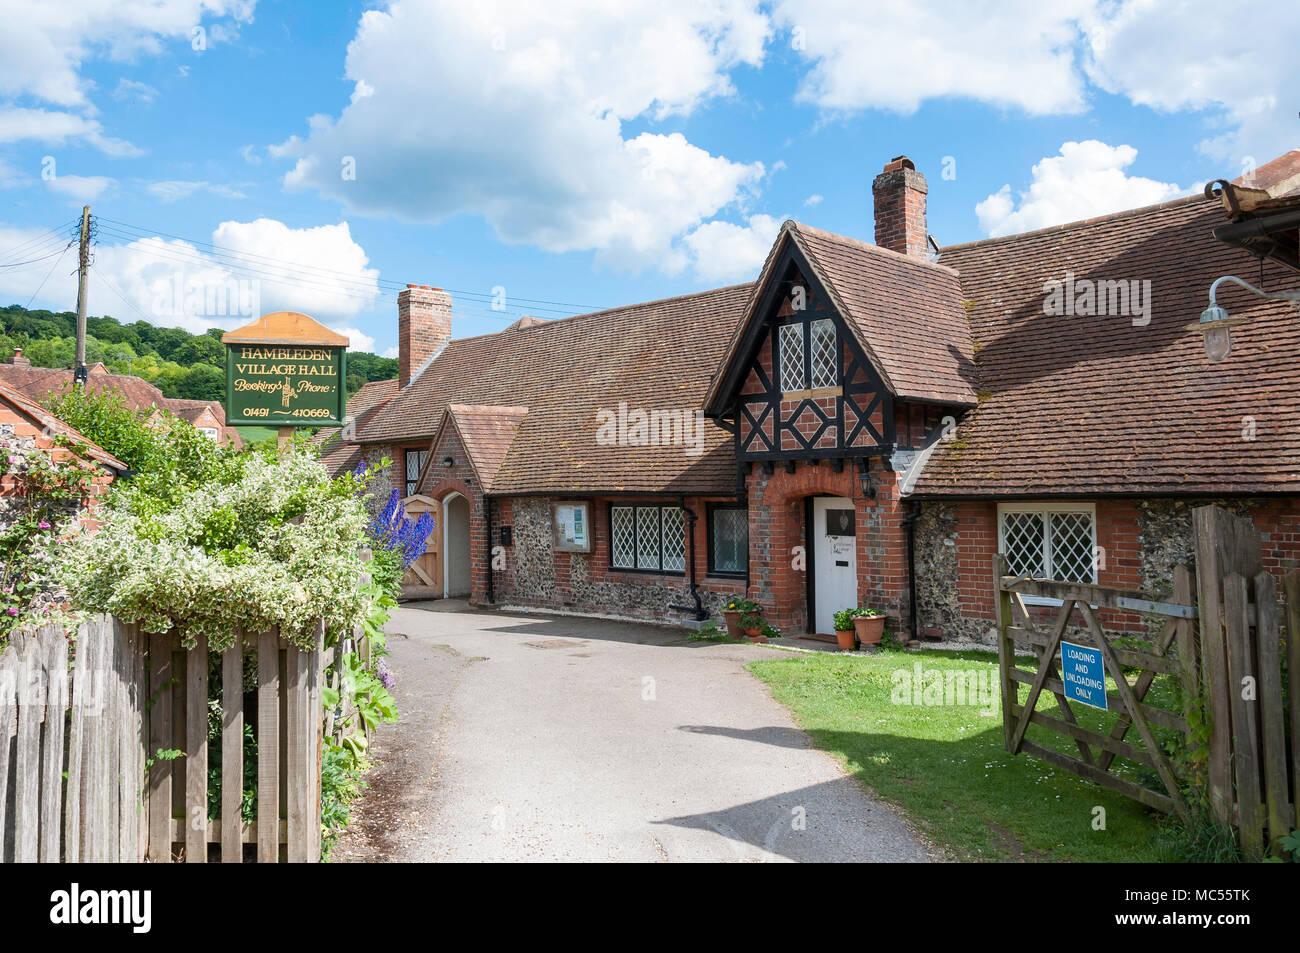 Hambledon Village Hall, Hambleden, Buckinghamshire, England, United Kingdom - Stock Image